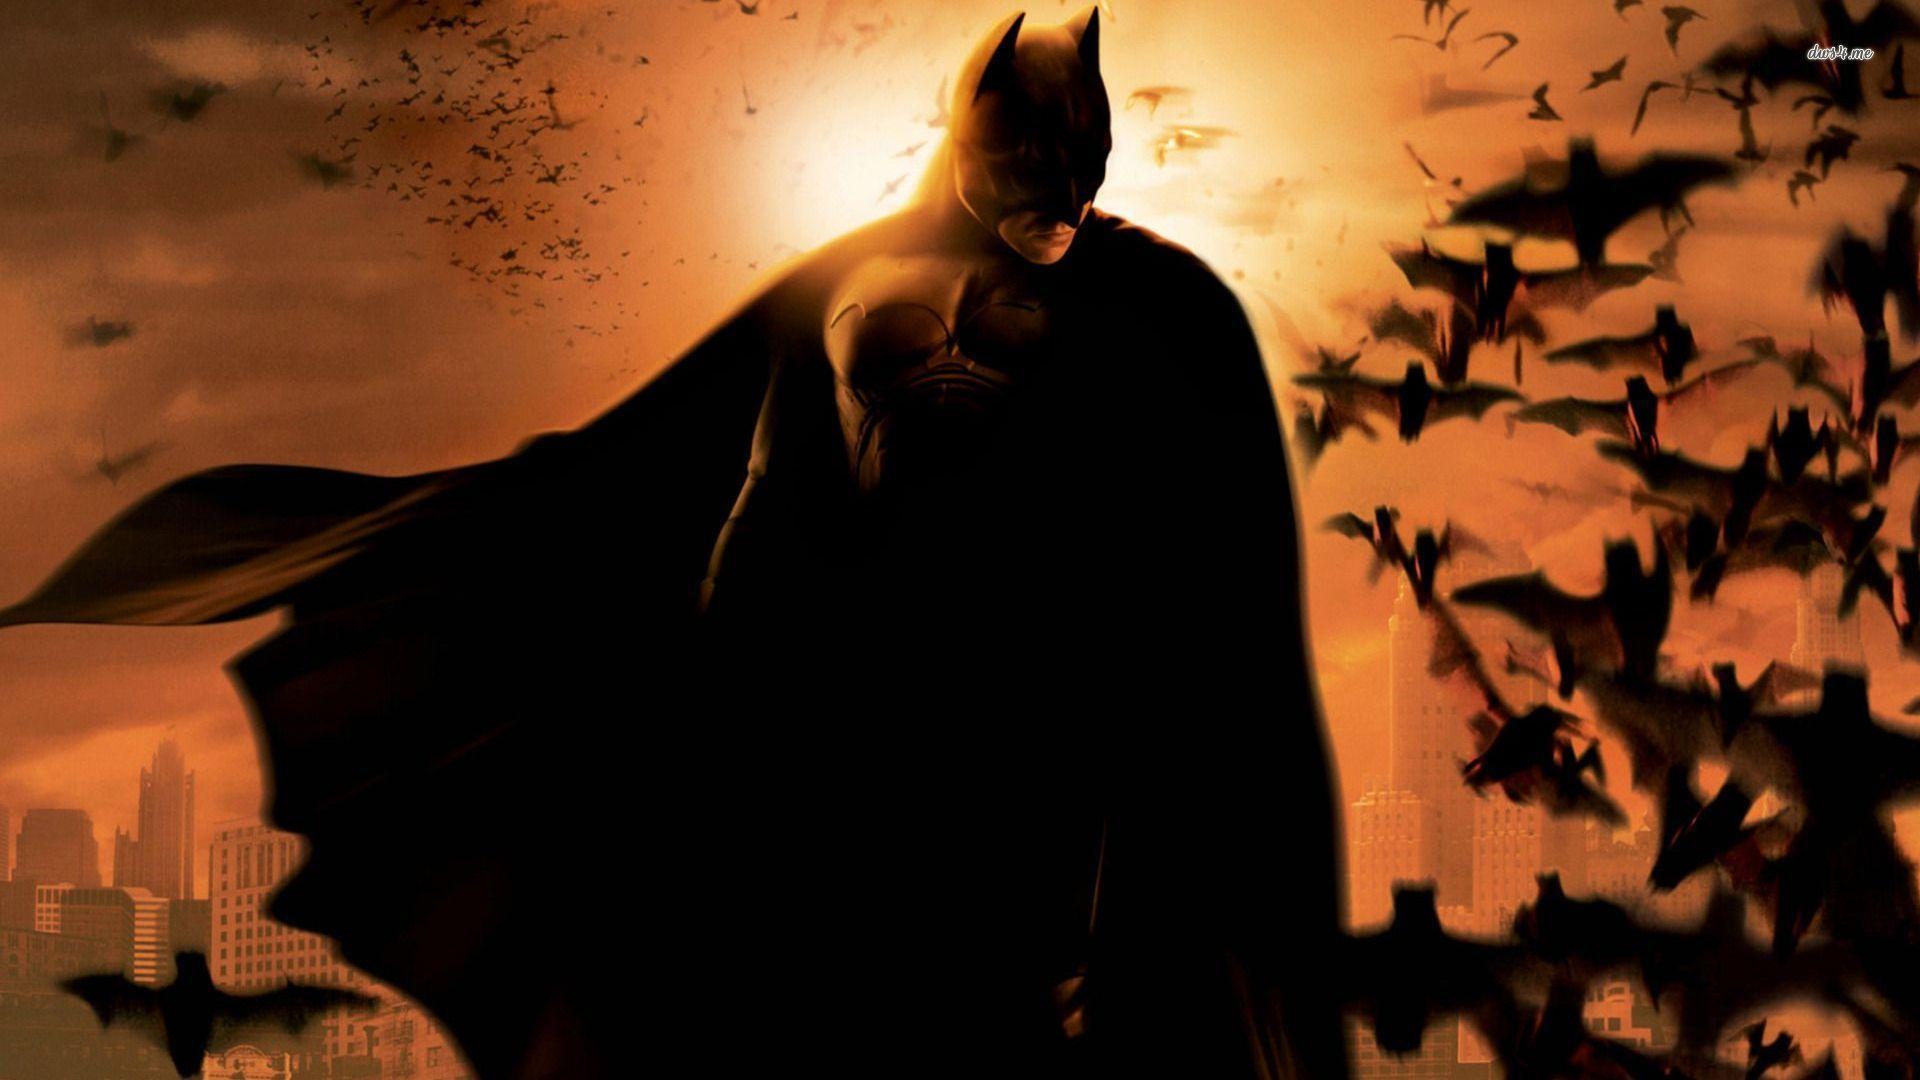 Batman Movie Wallpaper Desktop Download Movie #4681 Cinema Film ...